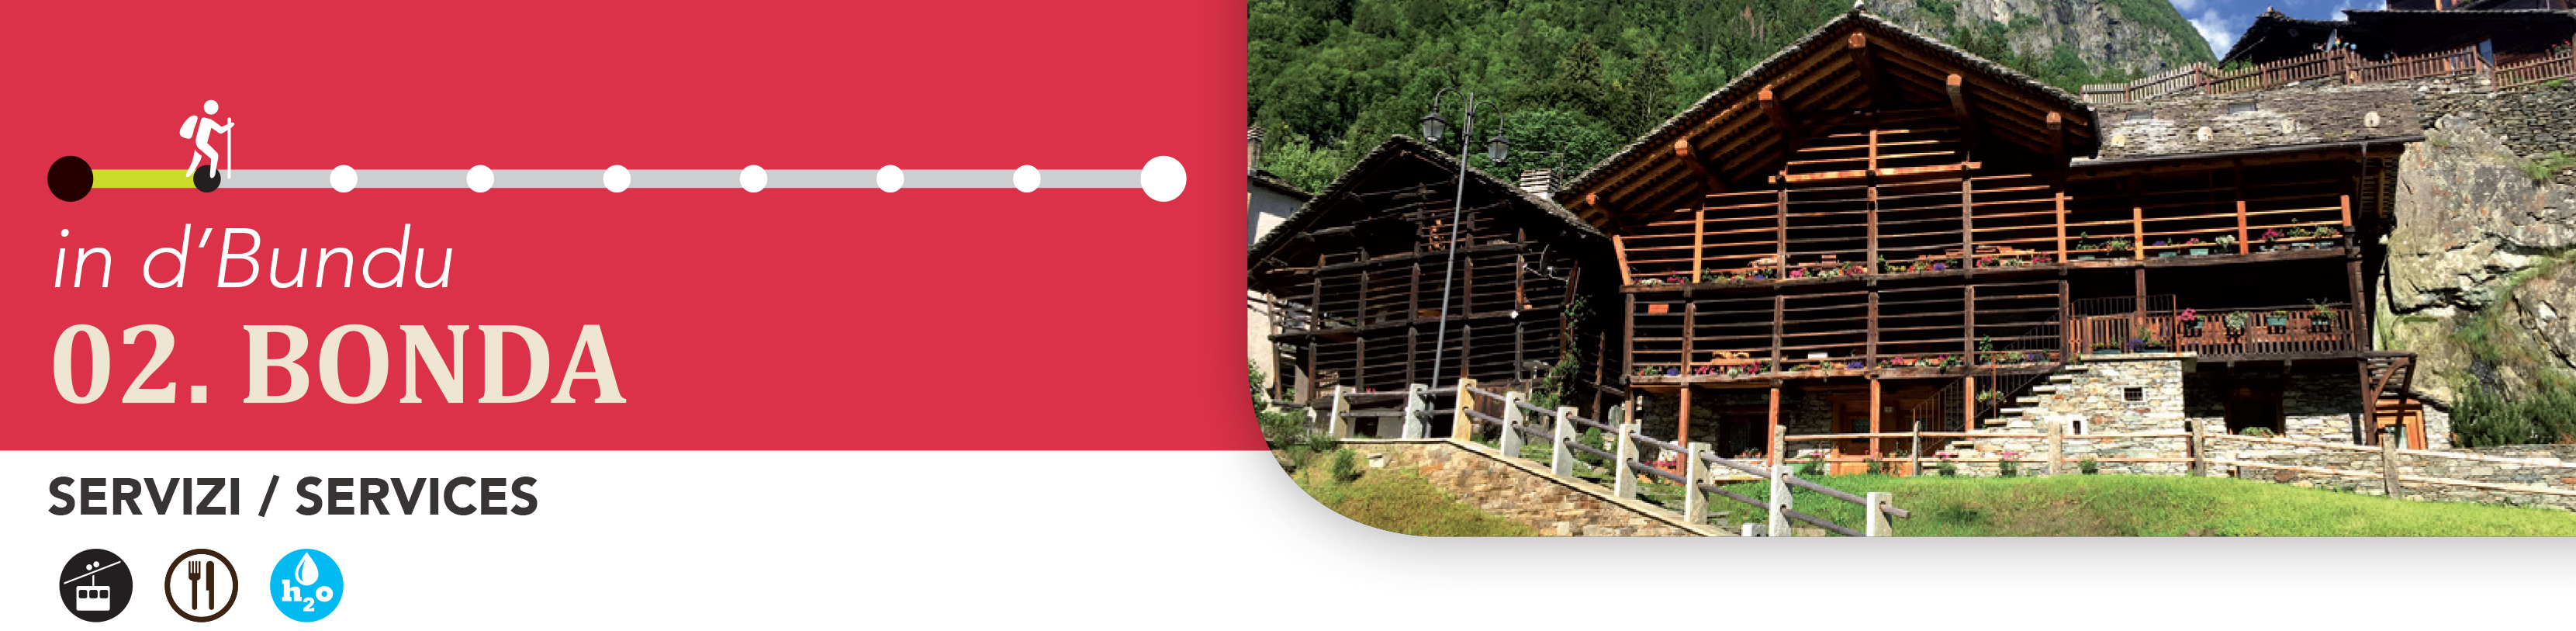 Bonda frazione alta di Alagna Valsesia